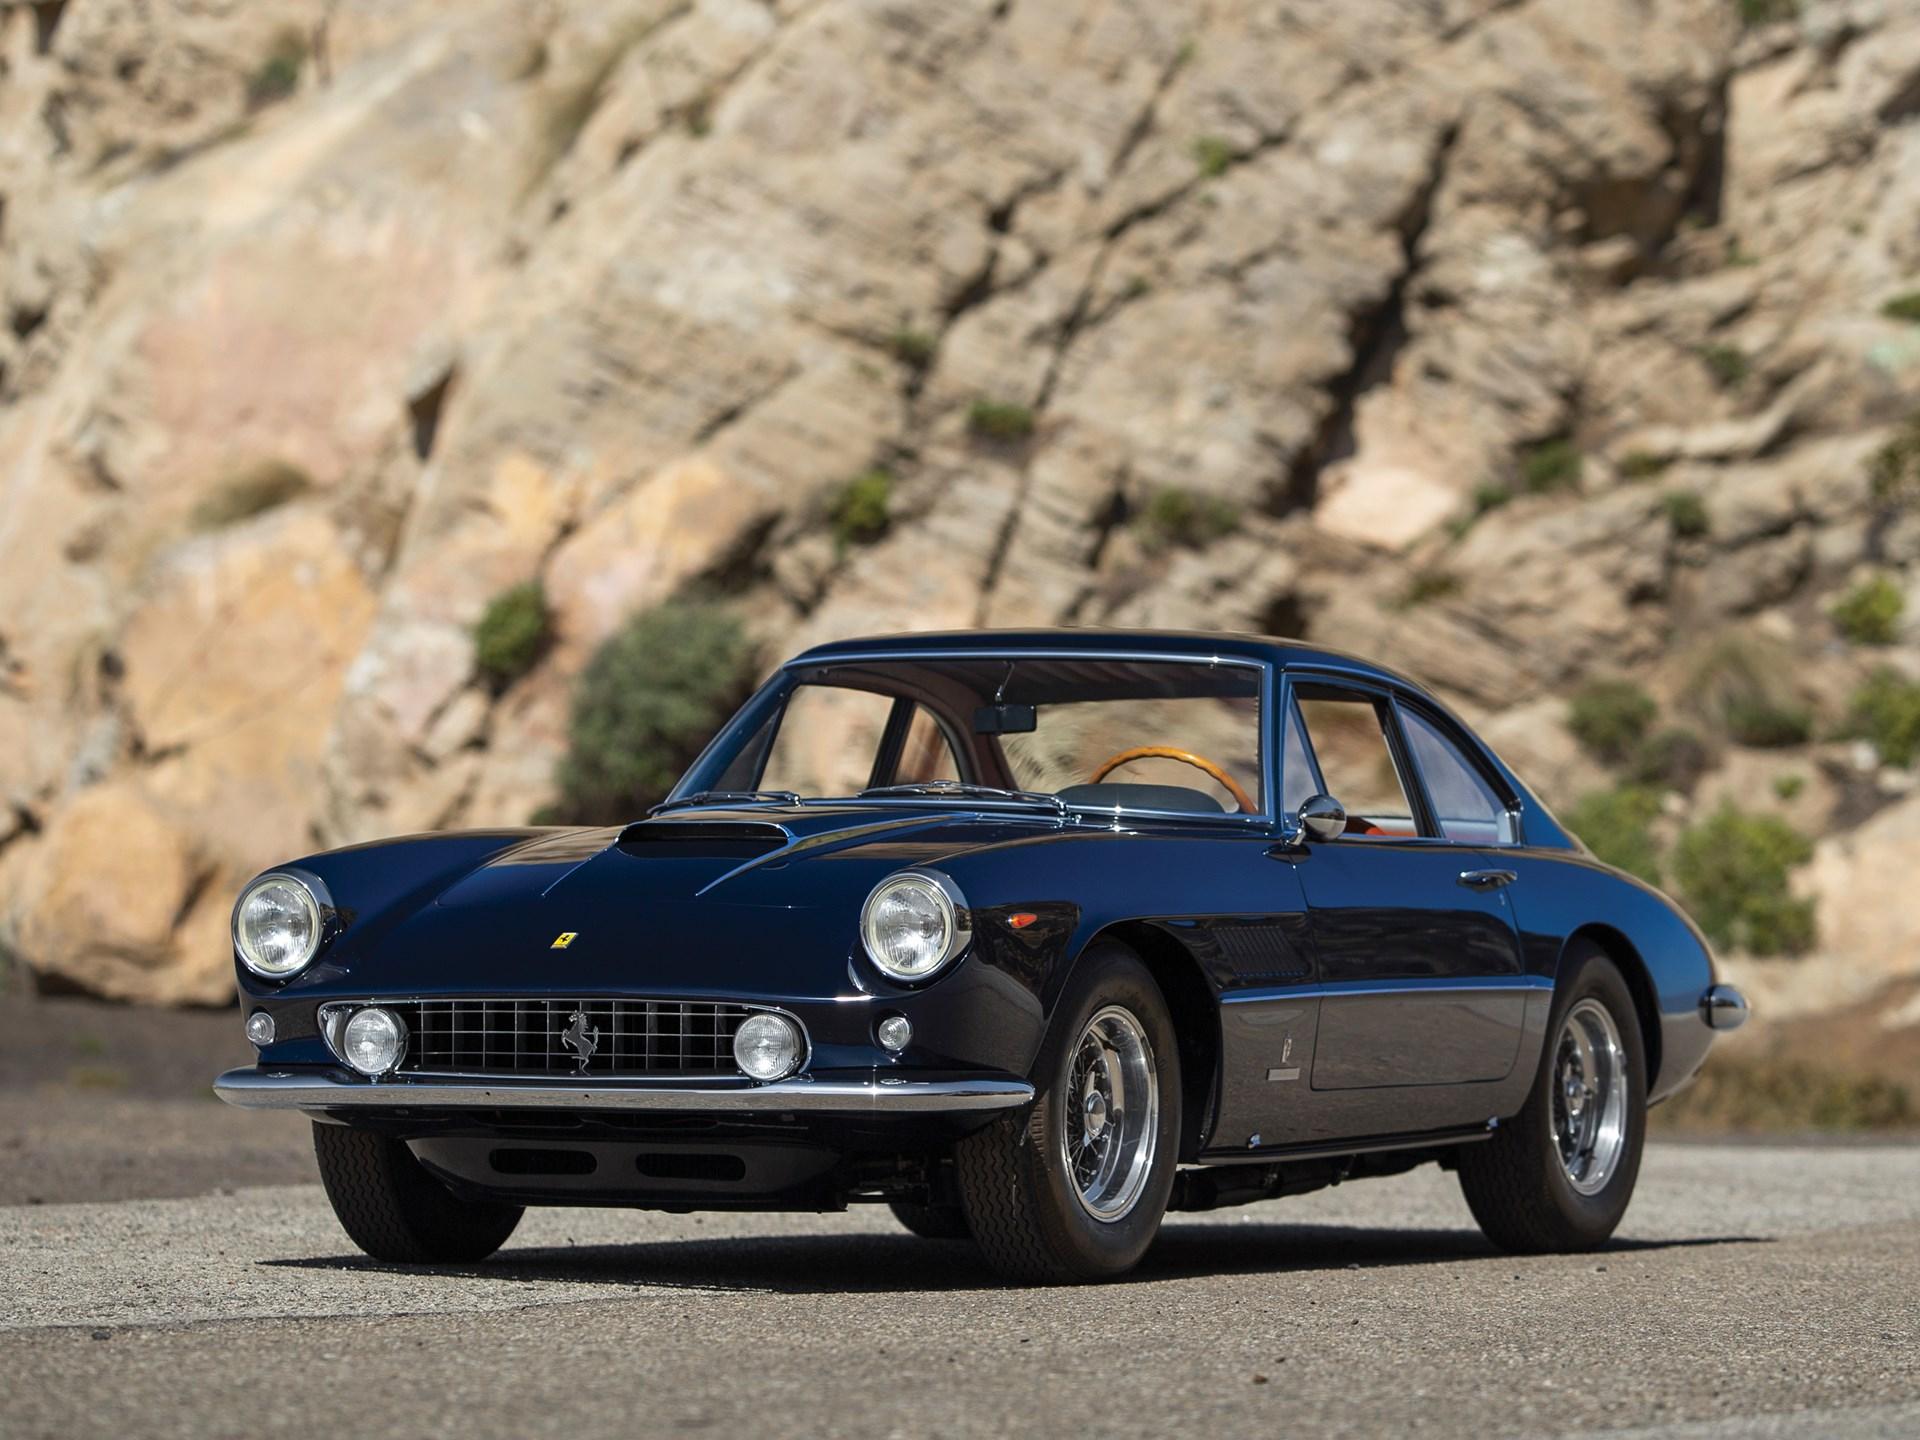 Image result for 1961 ferrari 400 RM MO19